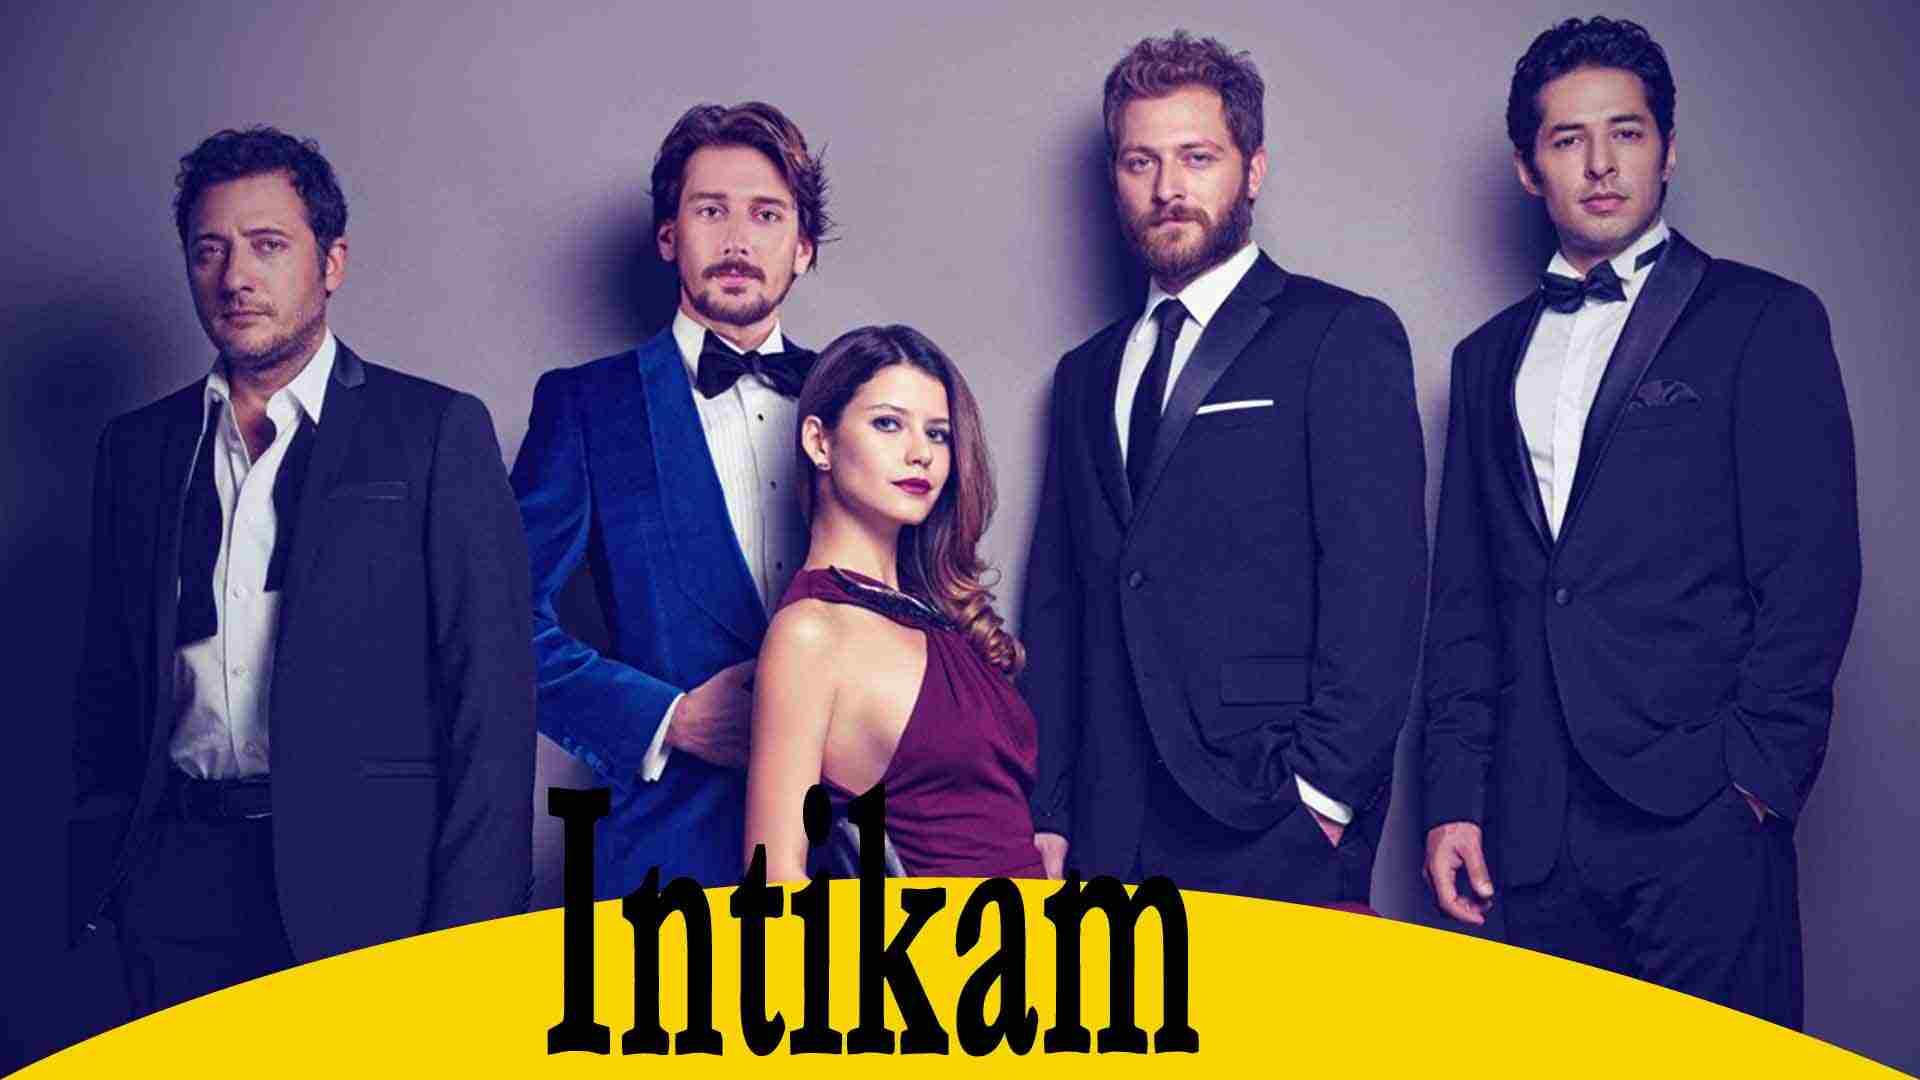 backdrop 1920 copy compressed 300x169 - best Turkish dramas in Urdu dubbed